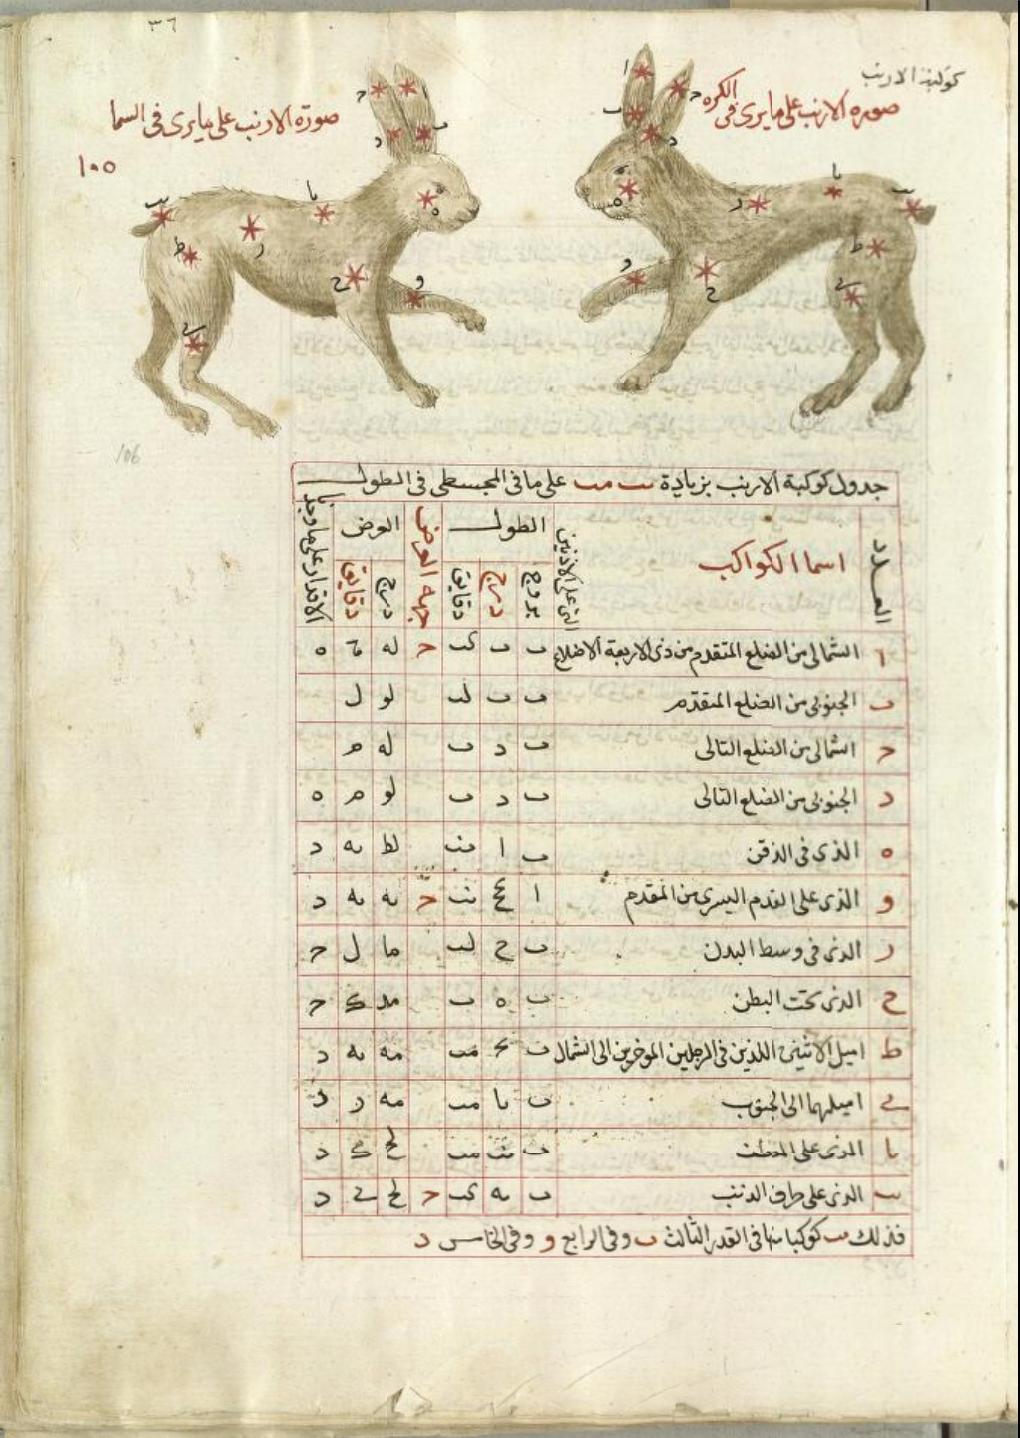 Title تصوير صور الكواكب Transcribed Title Taṣwir ṣuwar Al Kawakib Author ابو الحسين الصوفى Abu Al ḥusayn A Arab Culture Celestial Map Ptolemy I Soter